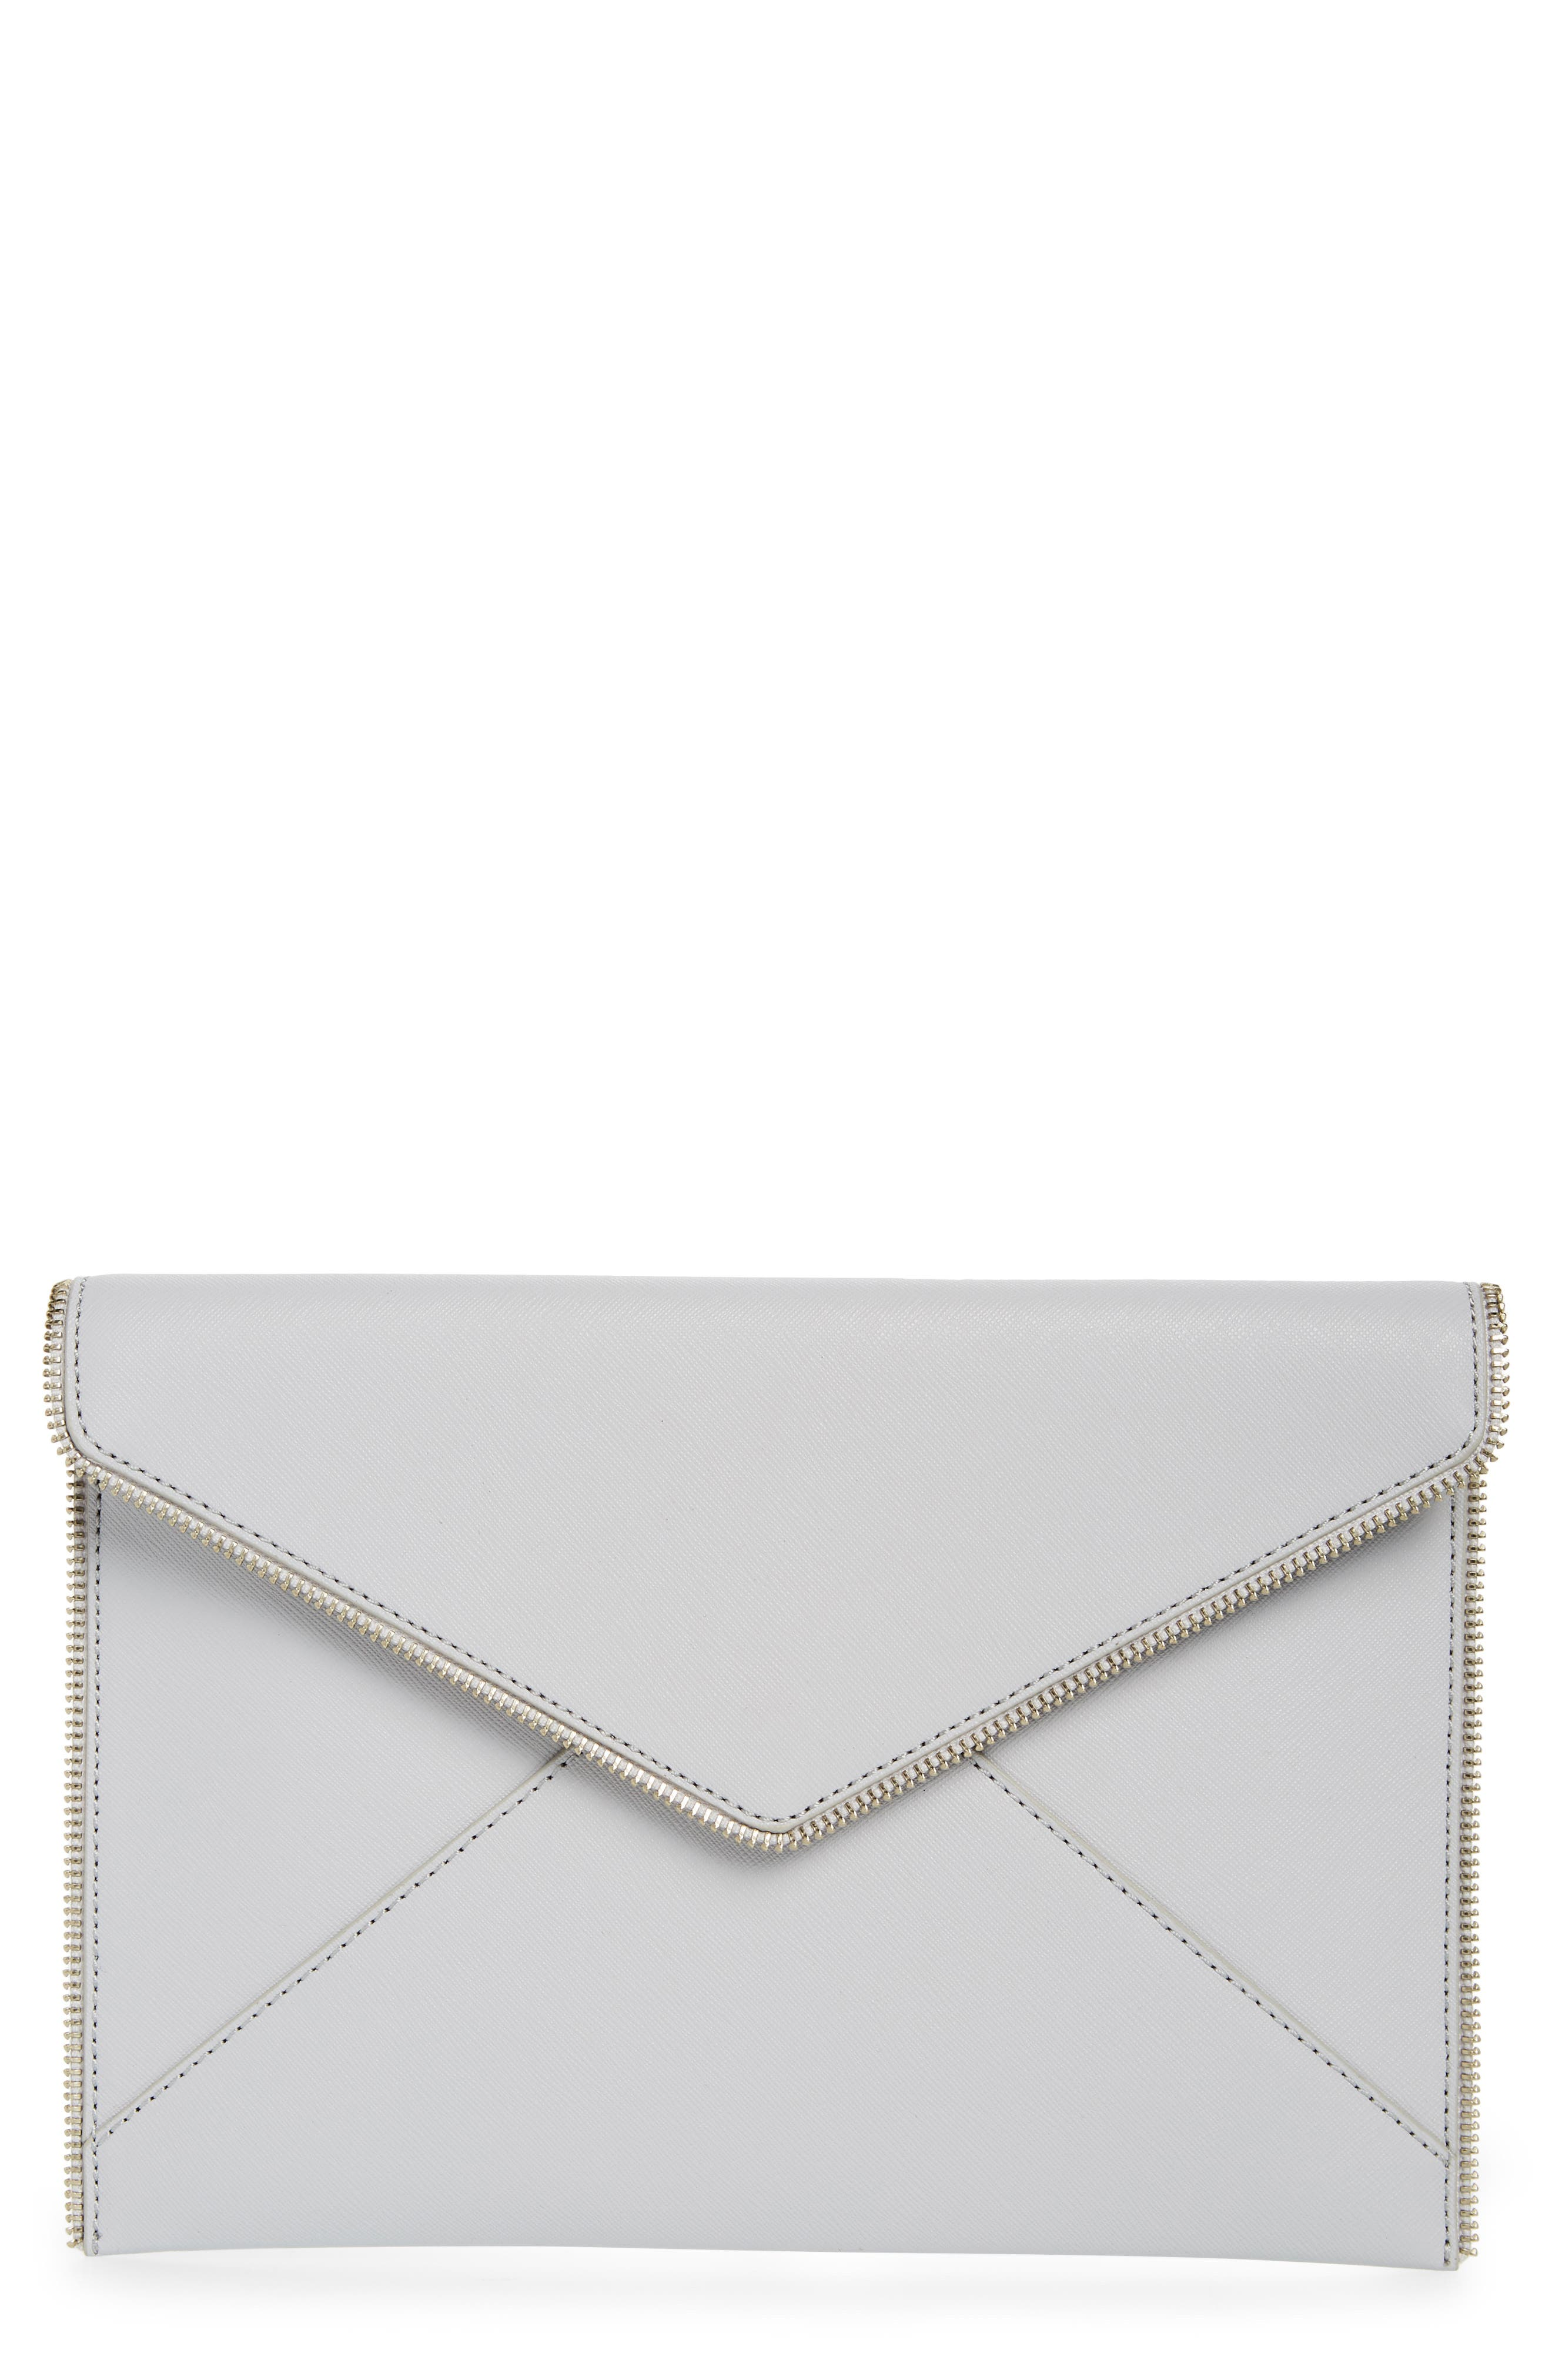 e1288a79c53f wedding purse